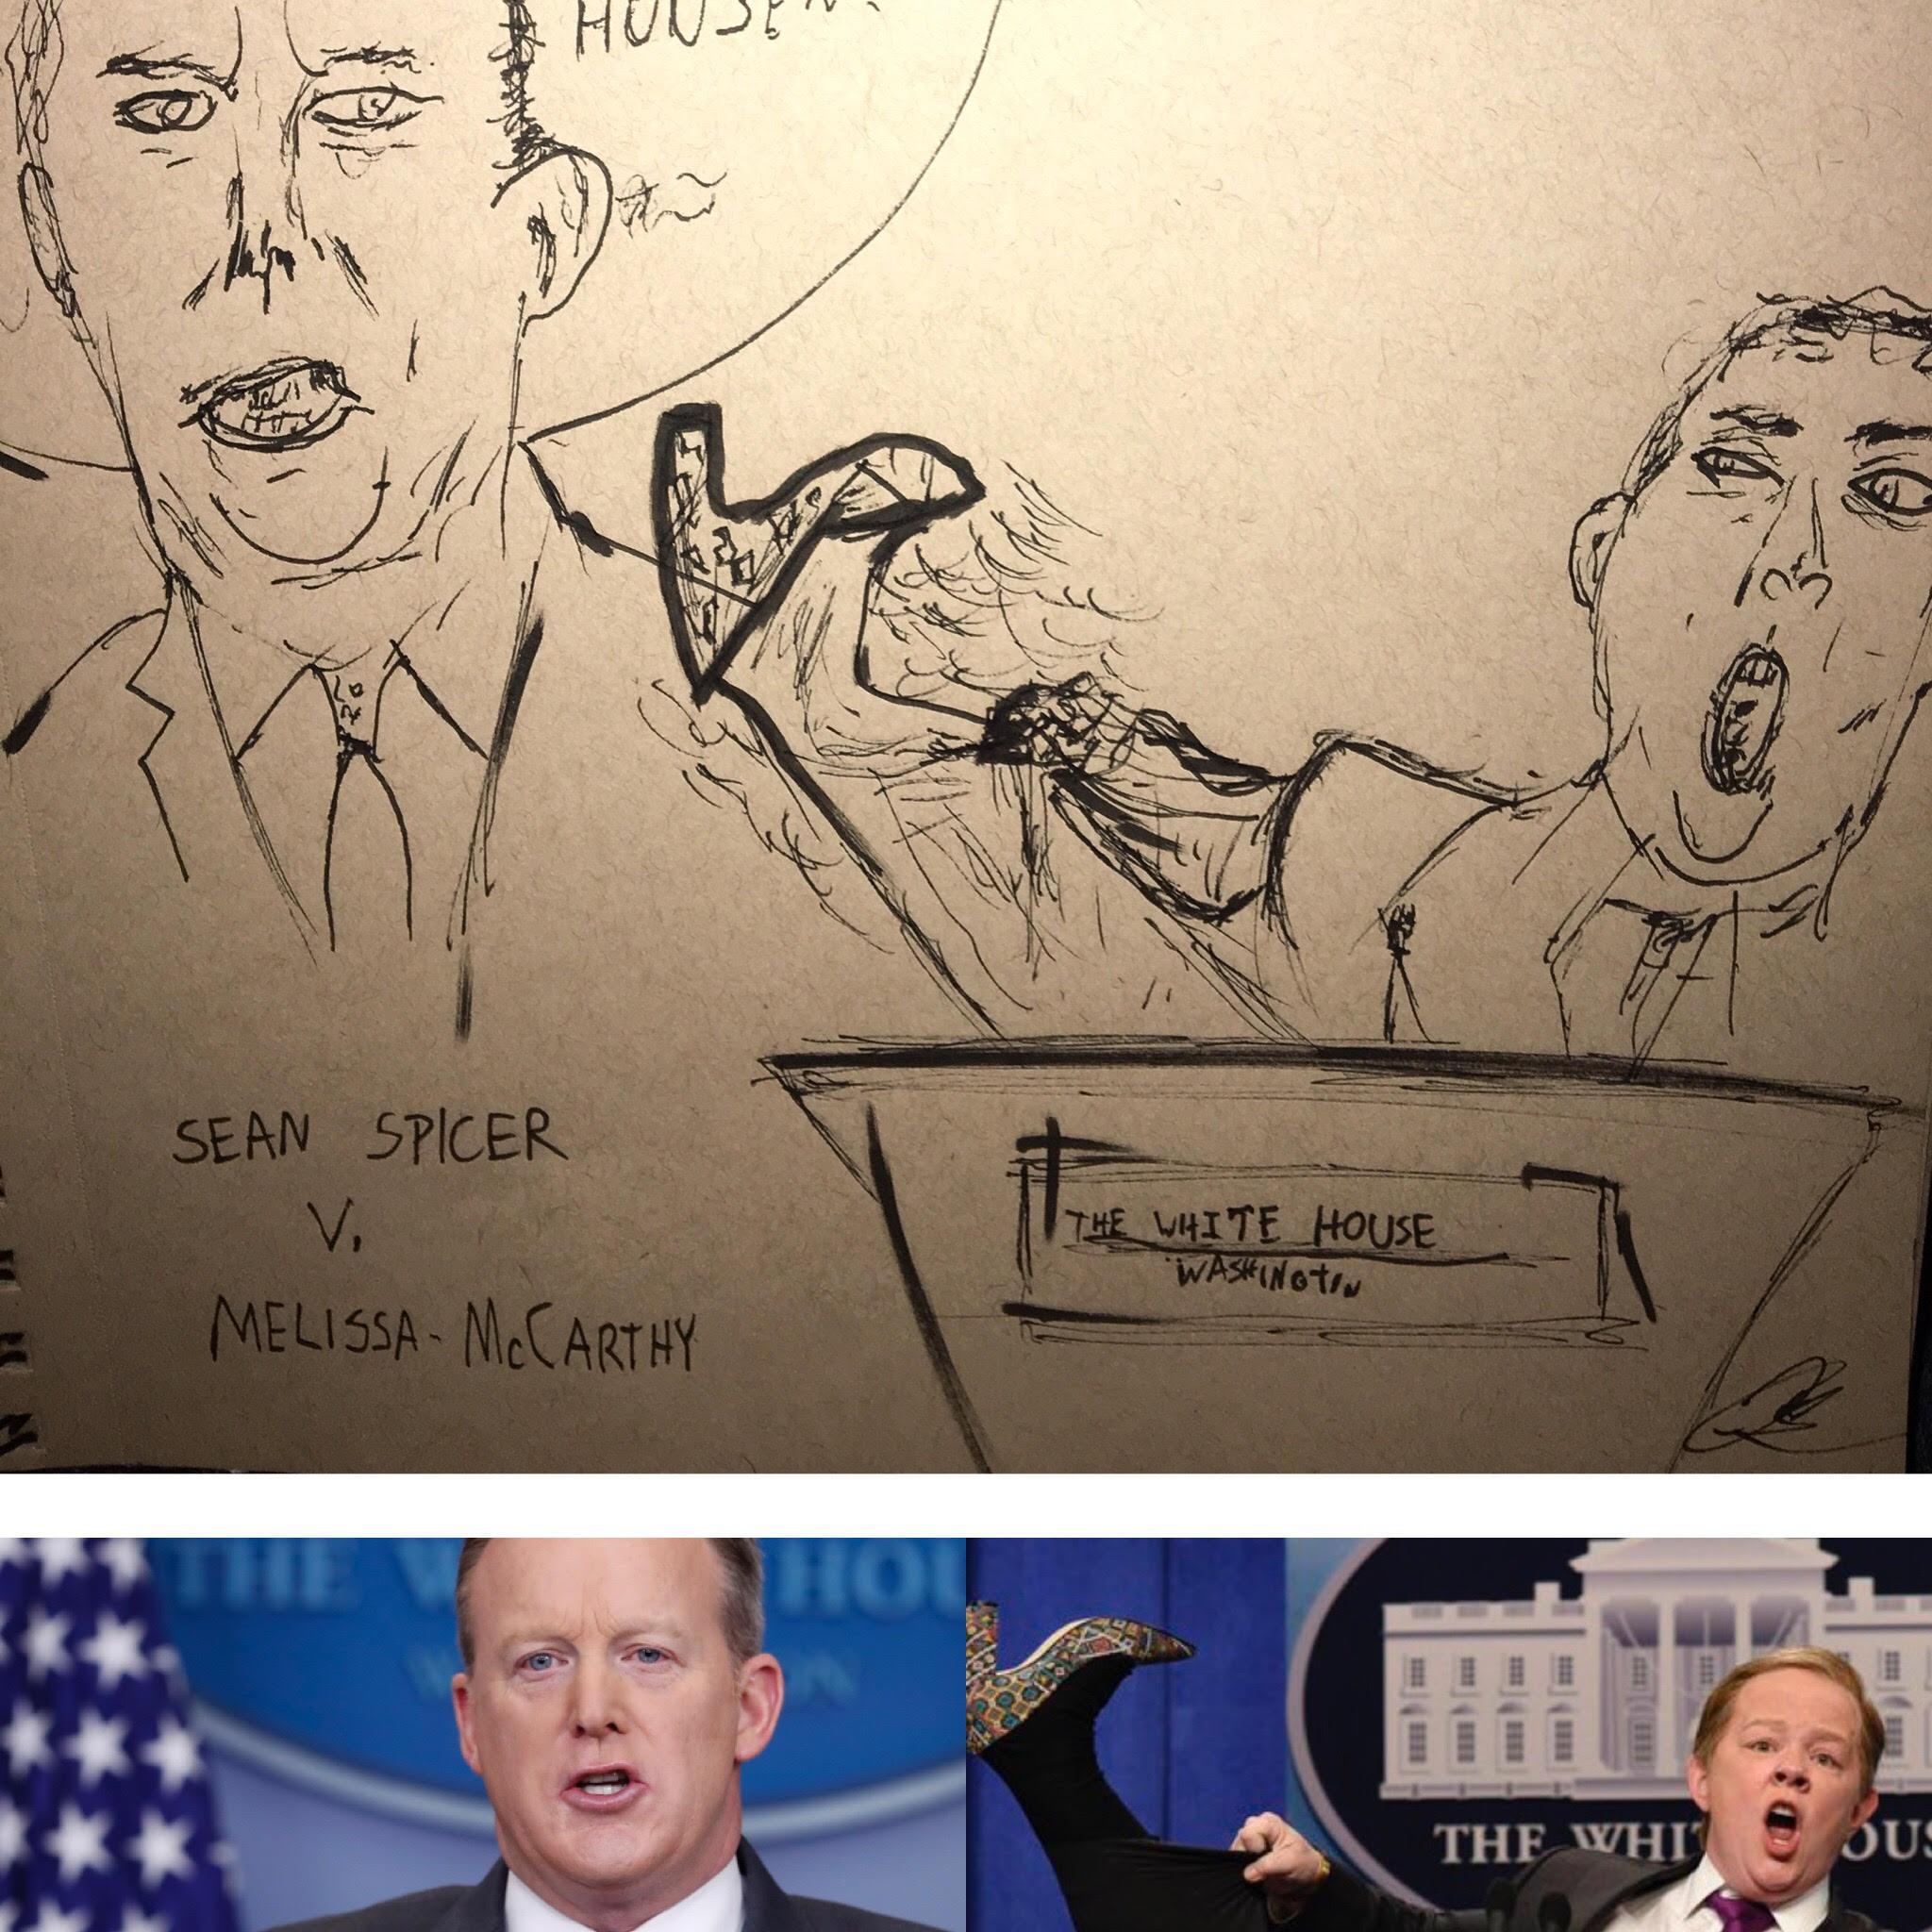 Melissa McCarthy V. Sean Spicer Political Satire Sketch